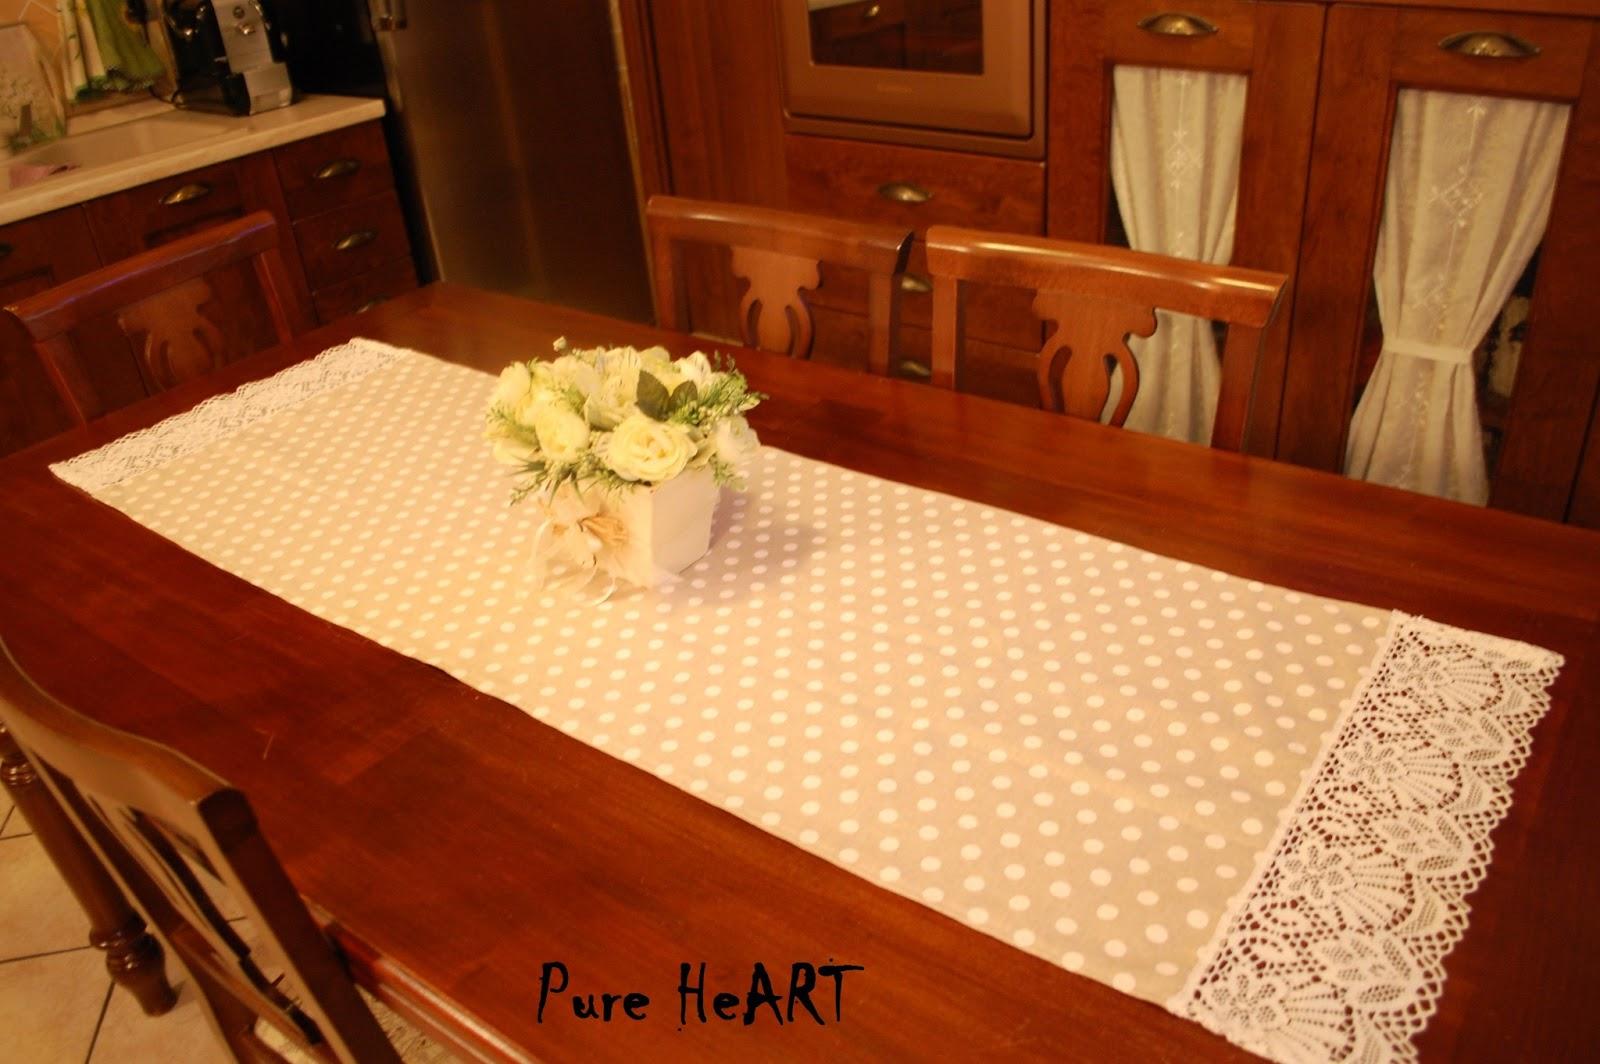 Pure heart di francesca pugliese runner da tavola country e shabby - Runner da tavolo ...